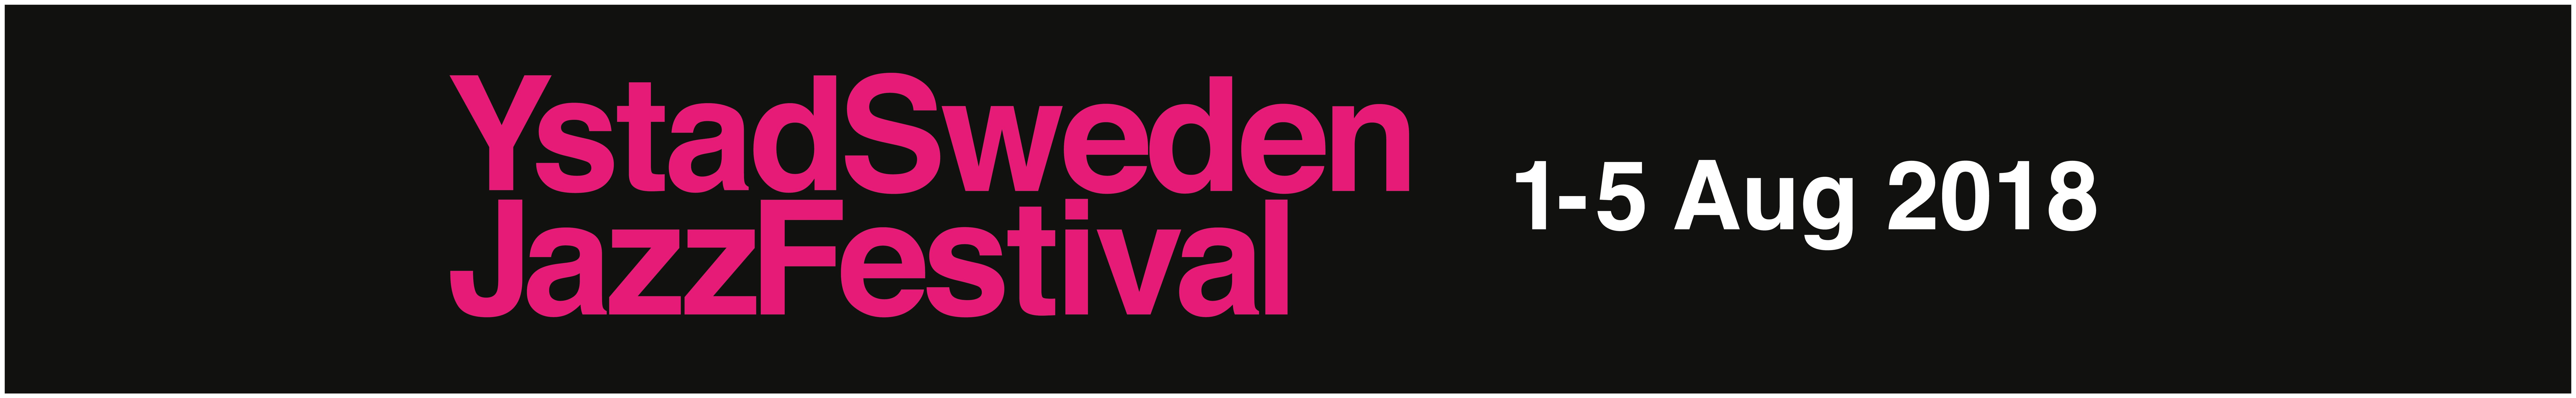 Ystad Sweden Jazz Festival